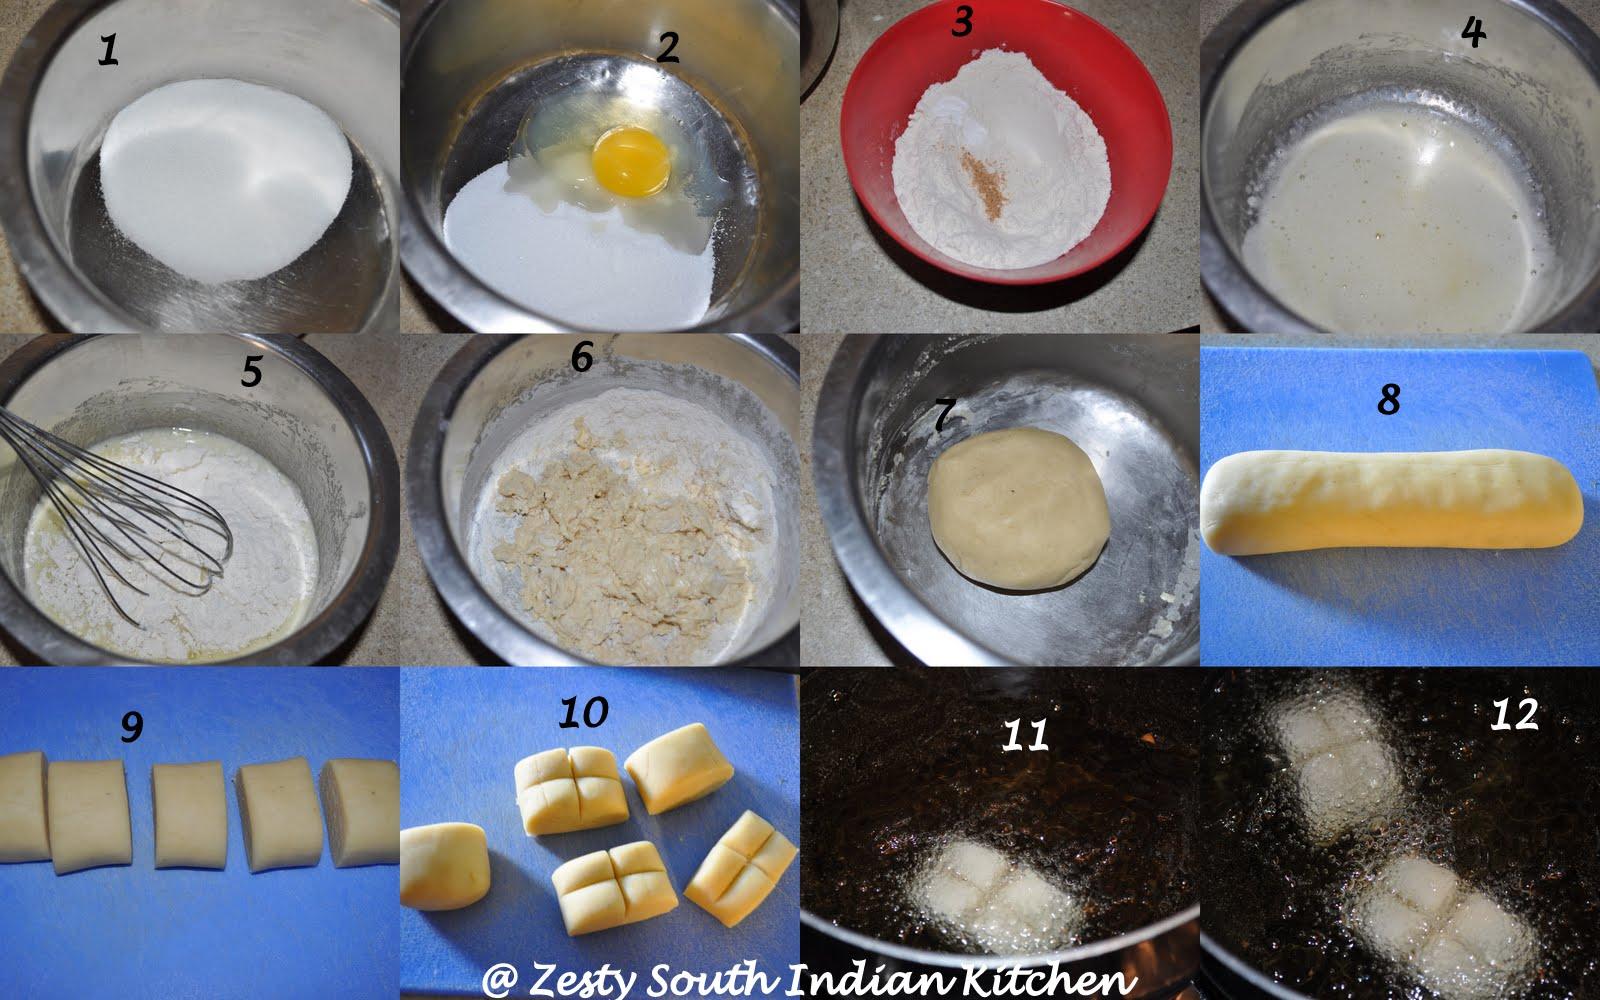 Lakshmi nair cooking blog giveaways